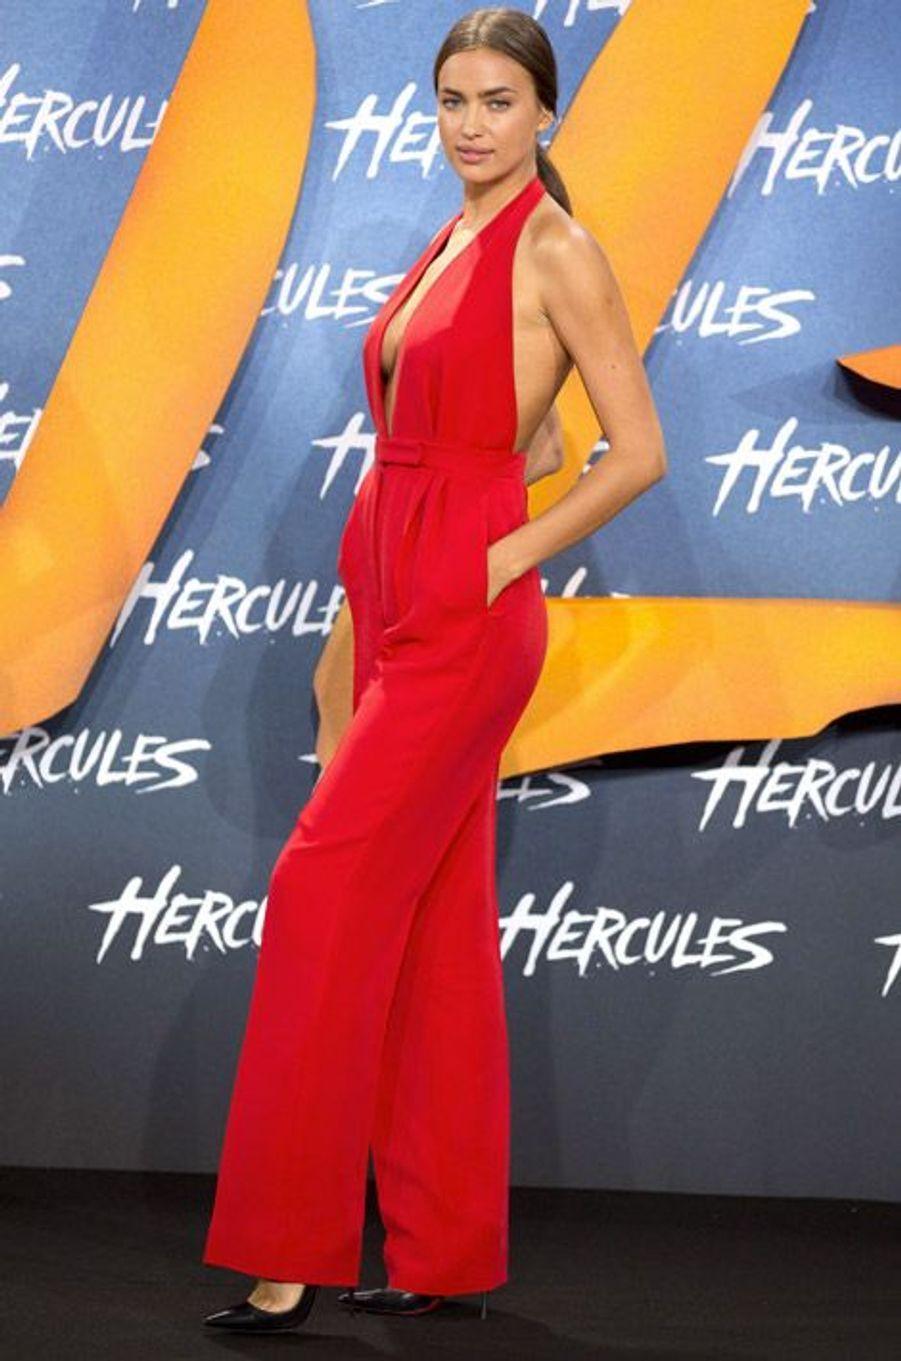 Le top Irina Shayk lors de la première du film Hercule à Berlin, le 21 août 2014